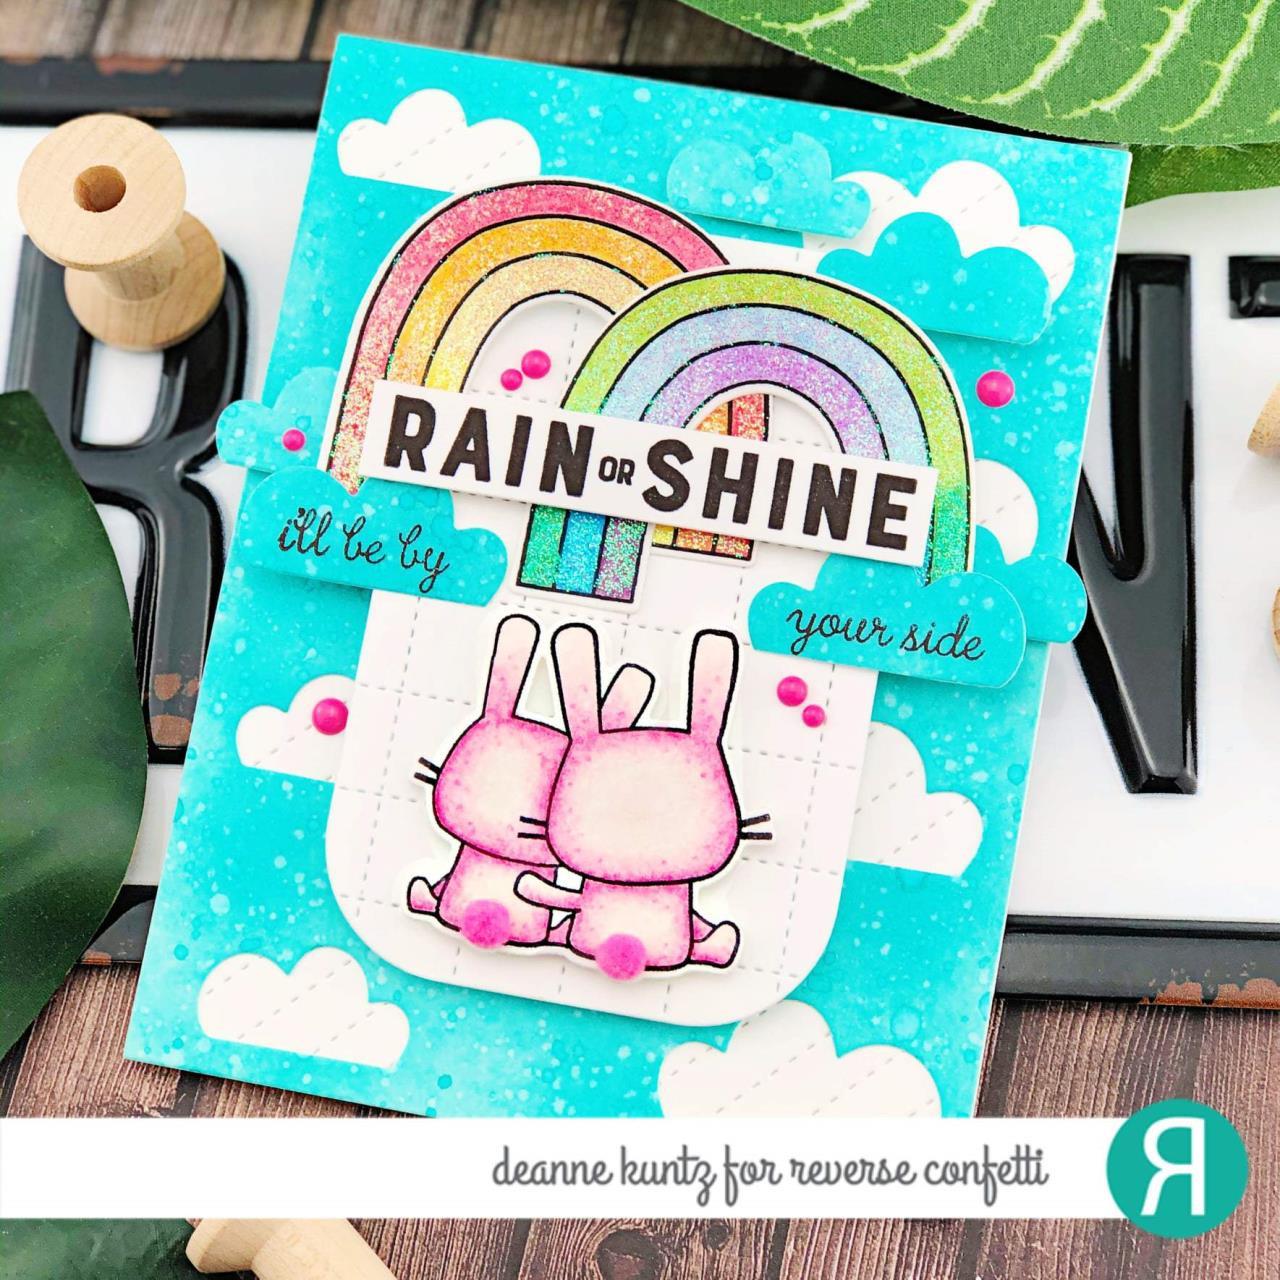 Cloudy Day Cover Panel, Reverse Confetti Cuts -